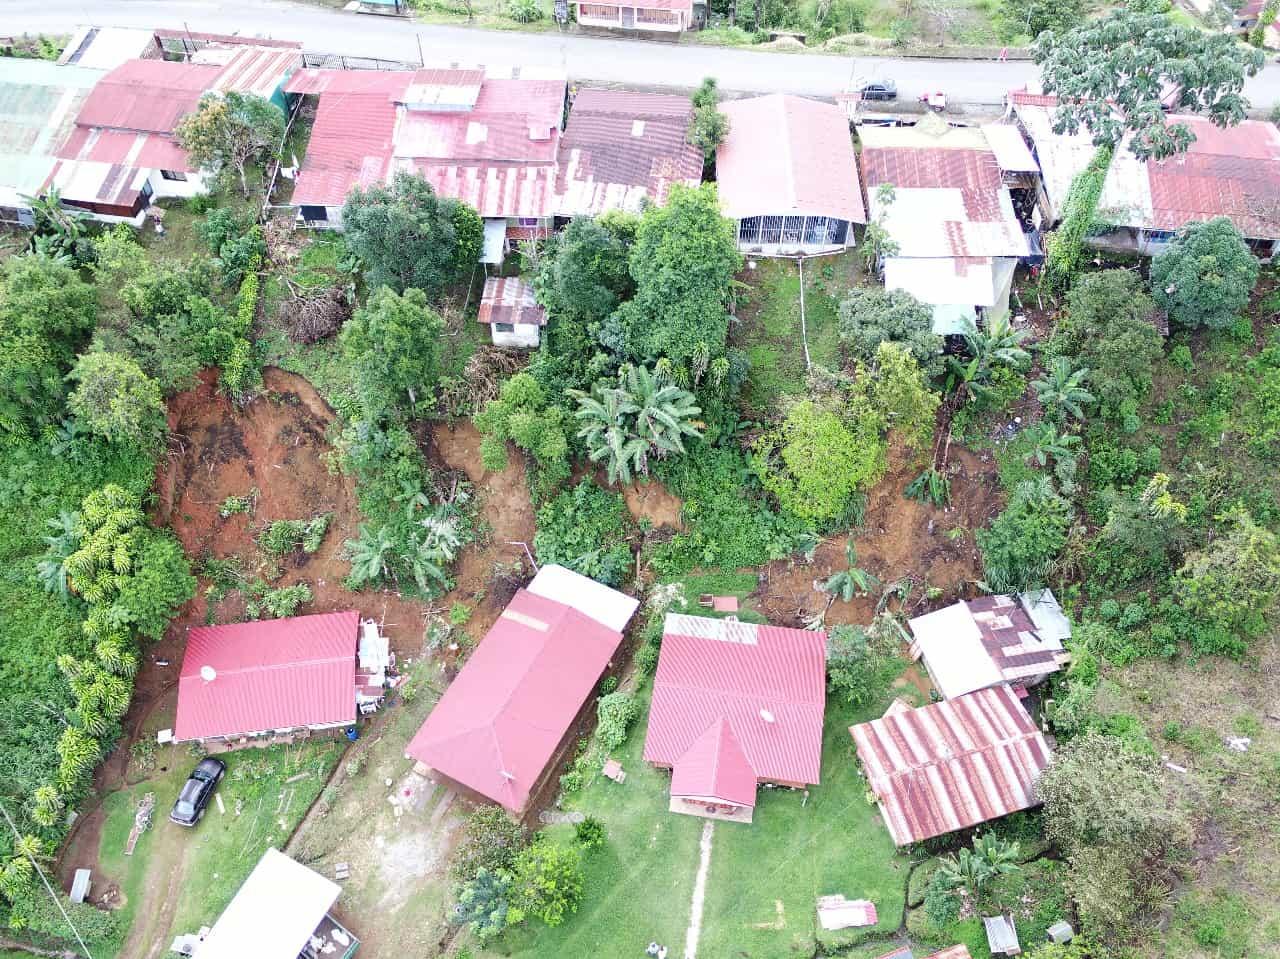 Landslides in Costa Rica in May 2018